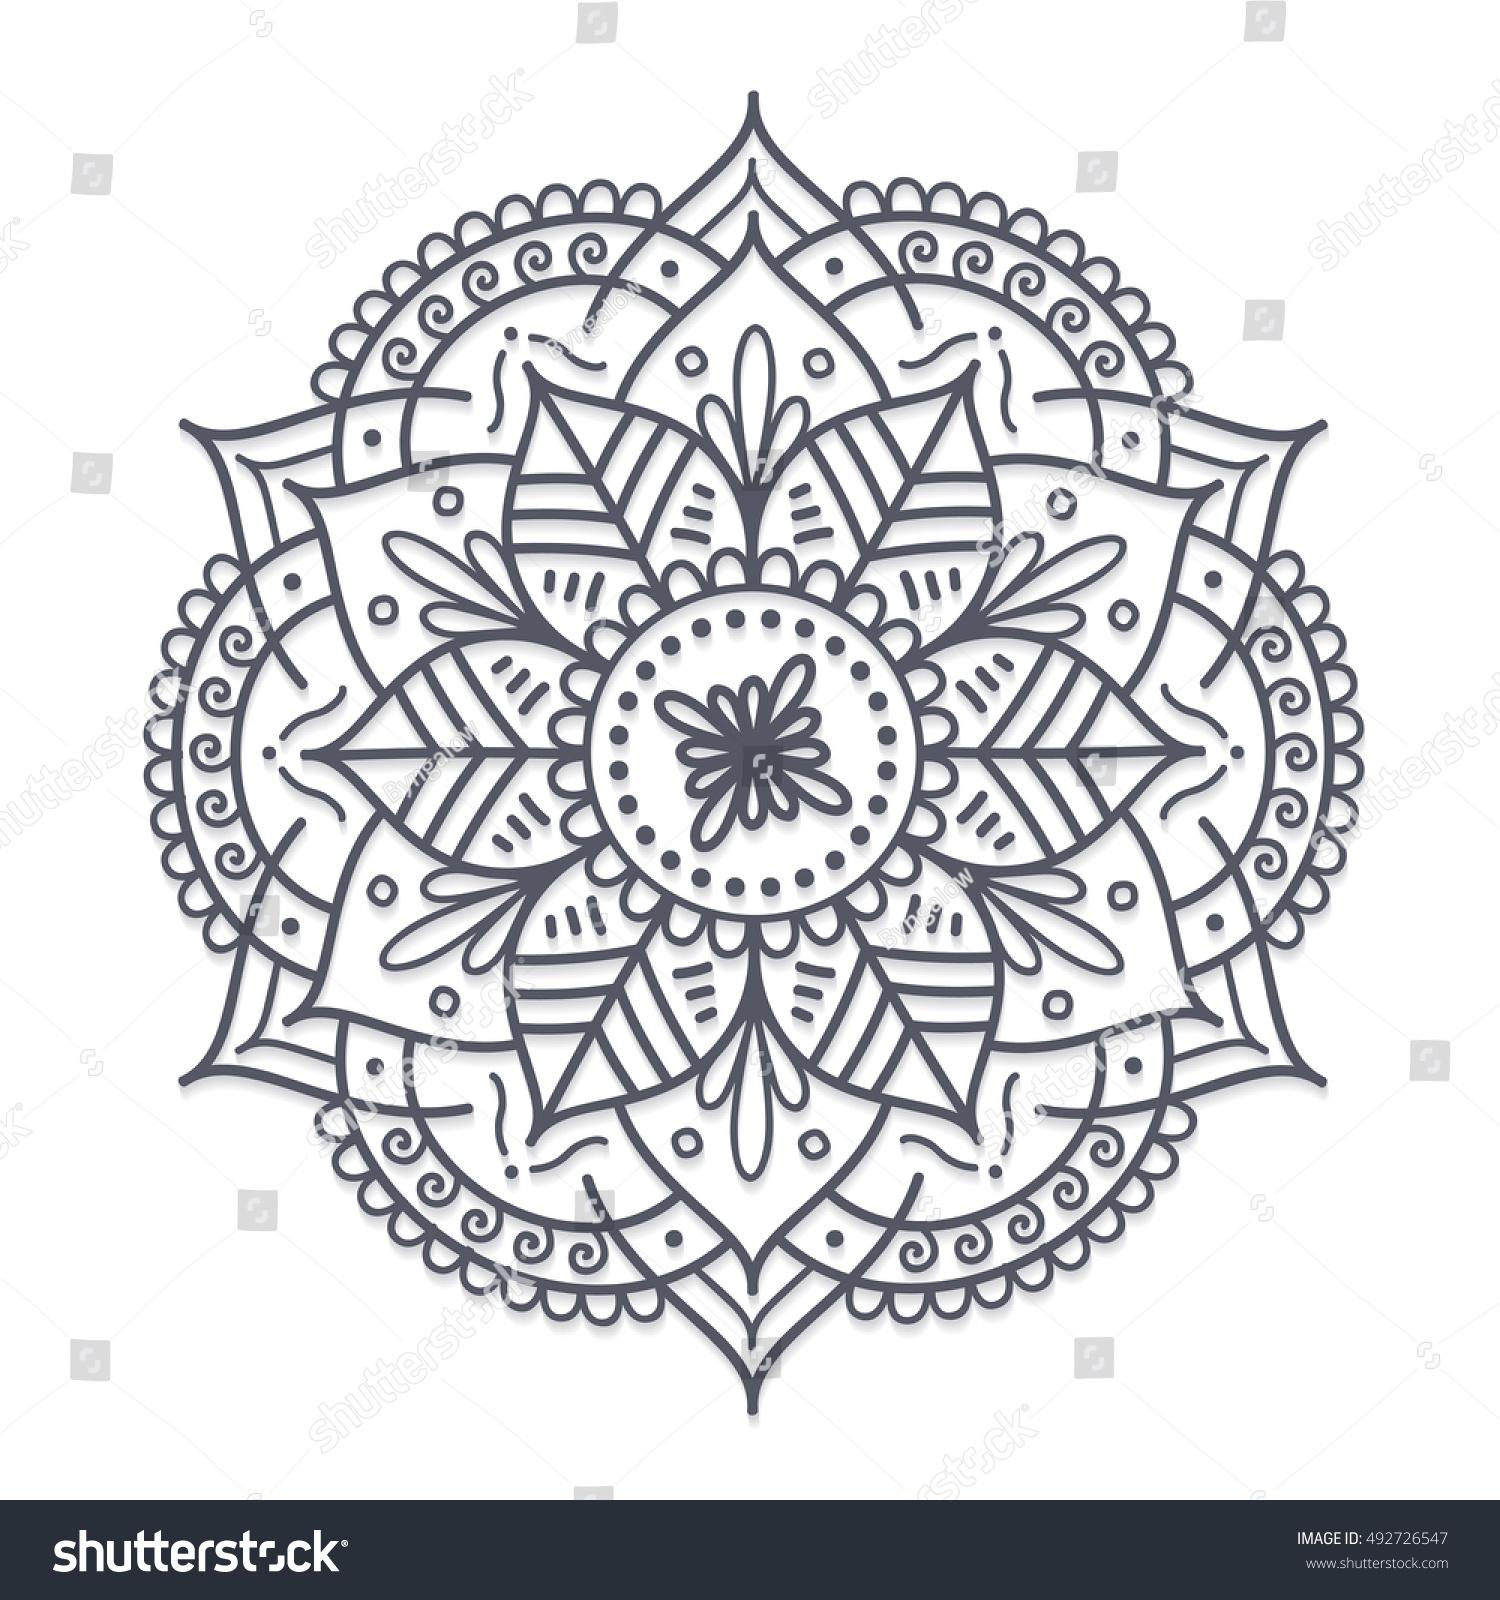 Henna Tattoo Vector: Vector Henna Flower Tattoo Mandala Mehndi Stock Vector